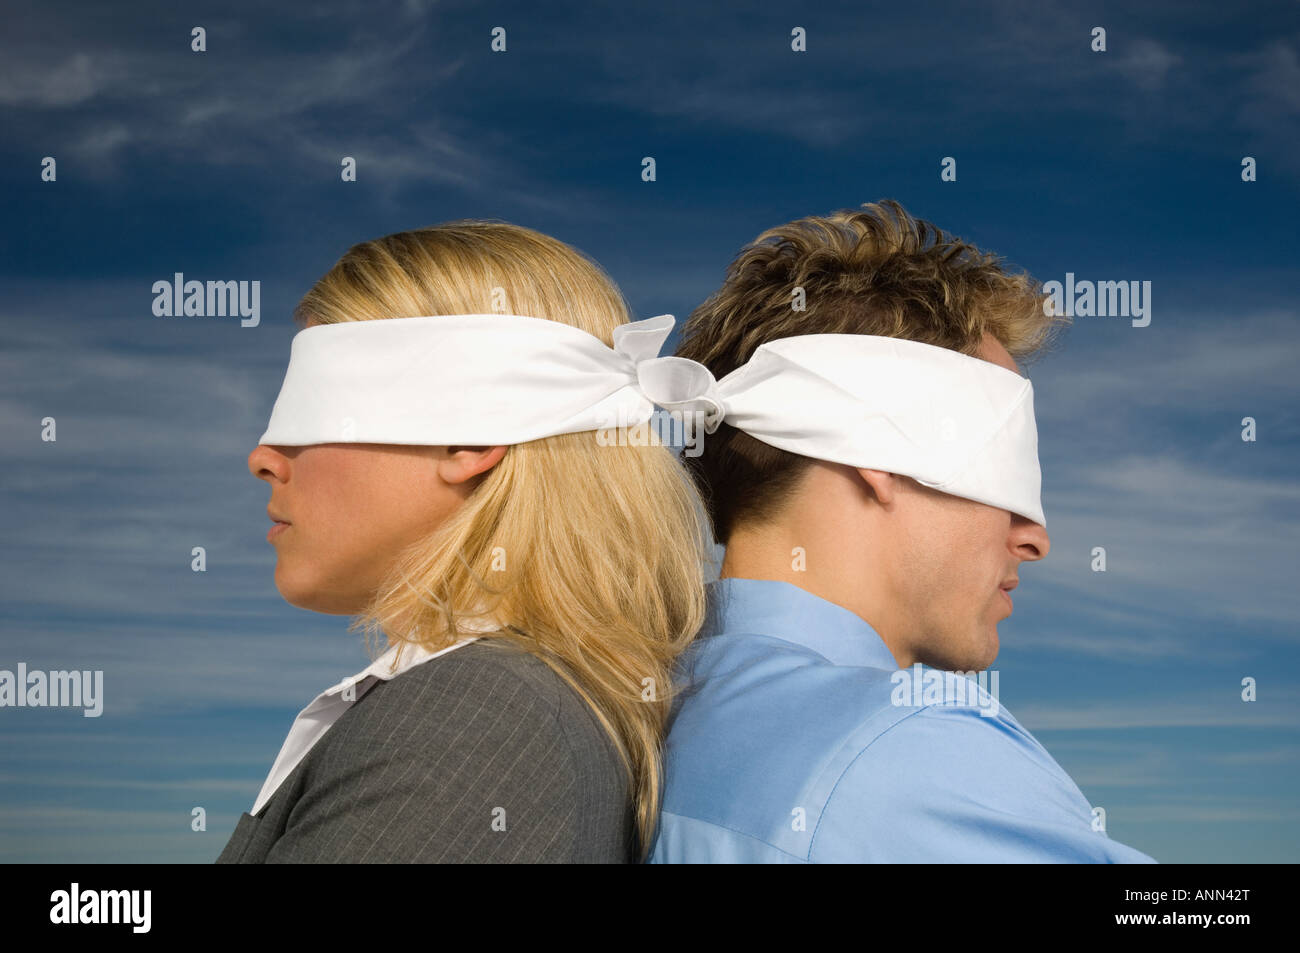 Blindfolded businesspeople standing back to back, Salt Flats, Utah, United States - Stock Image